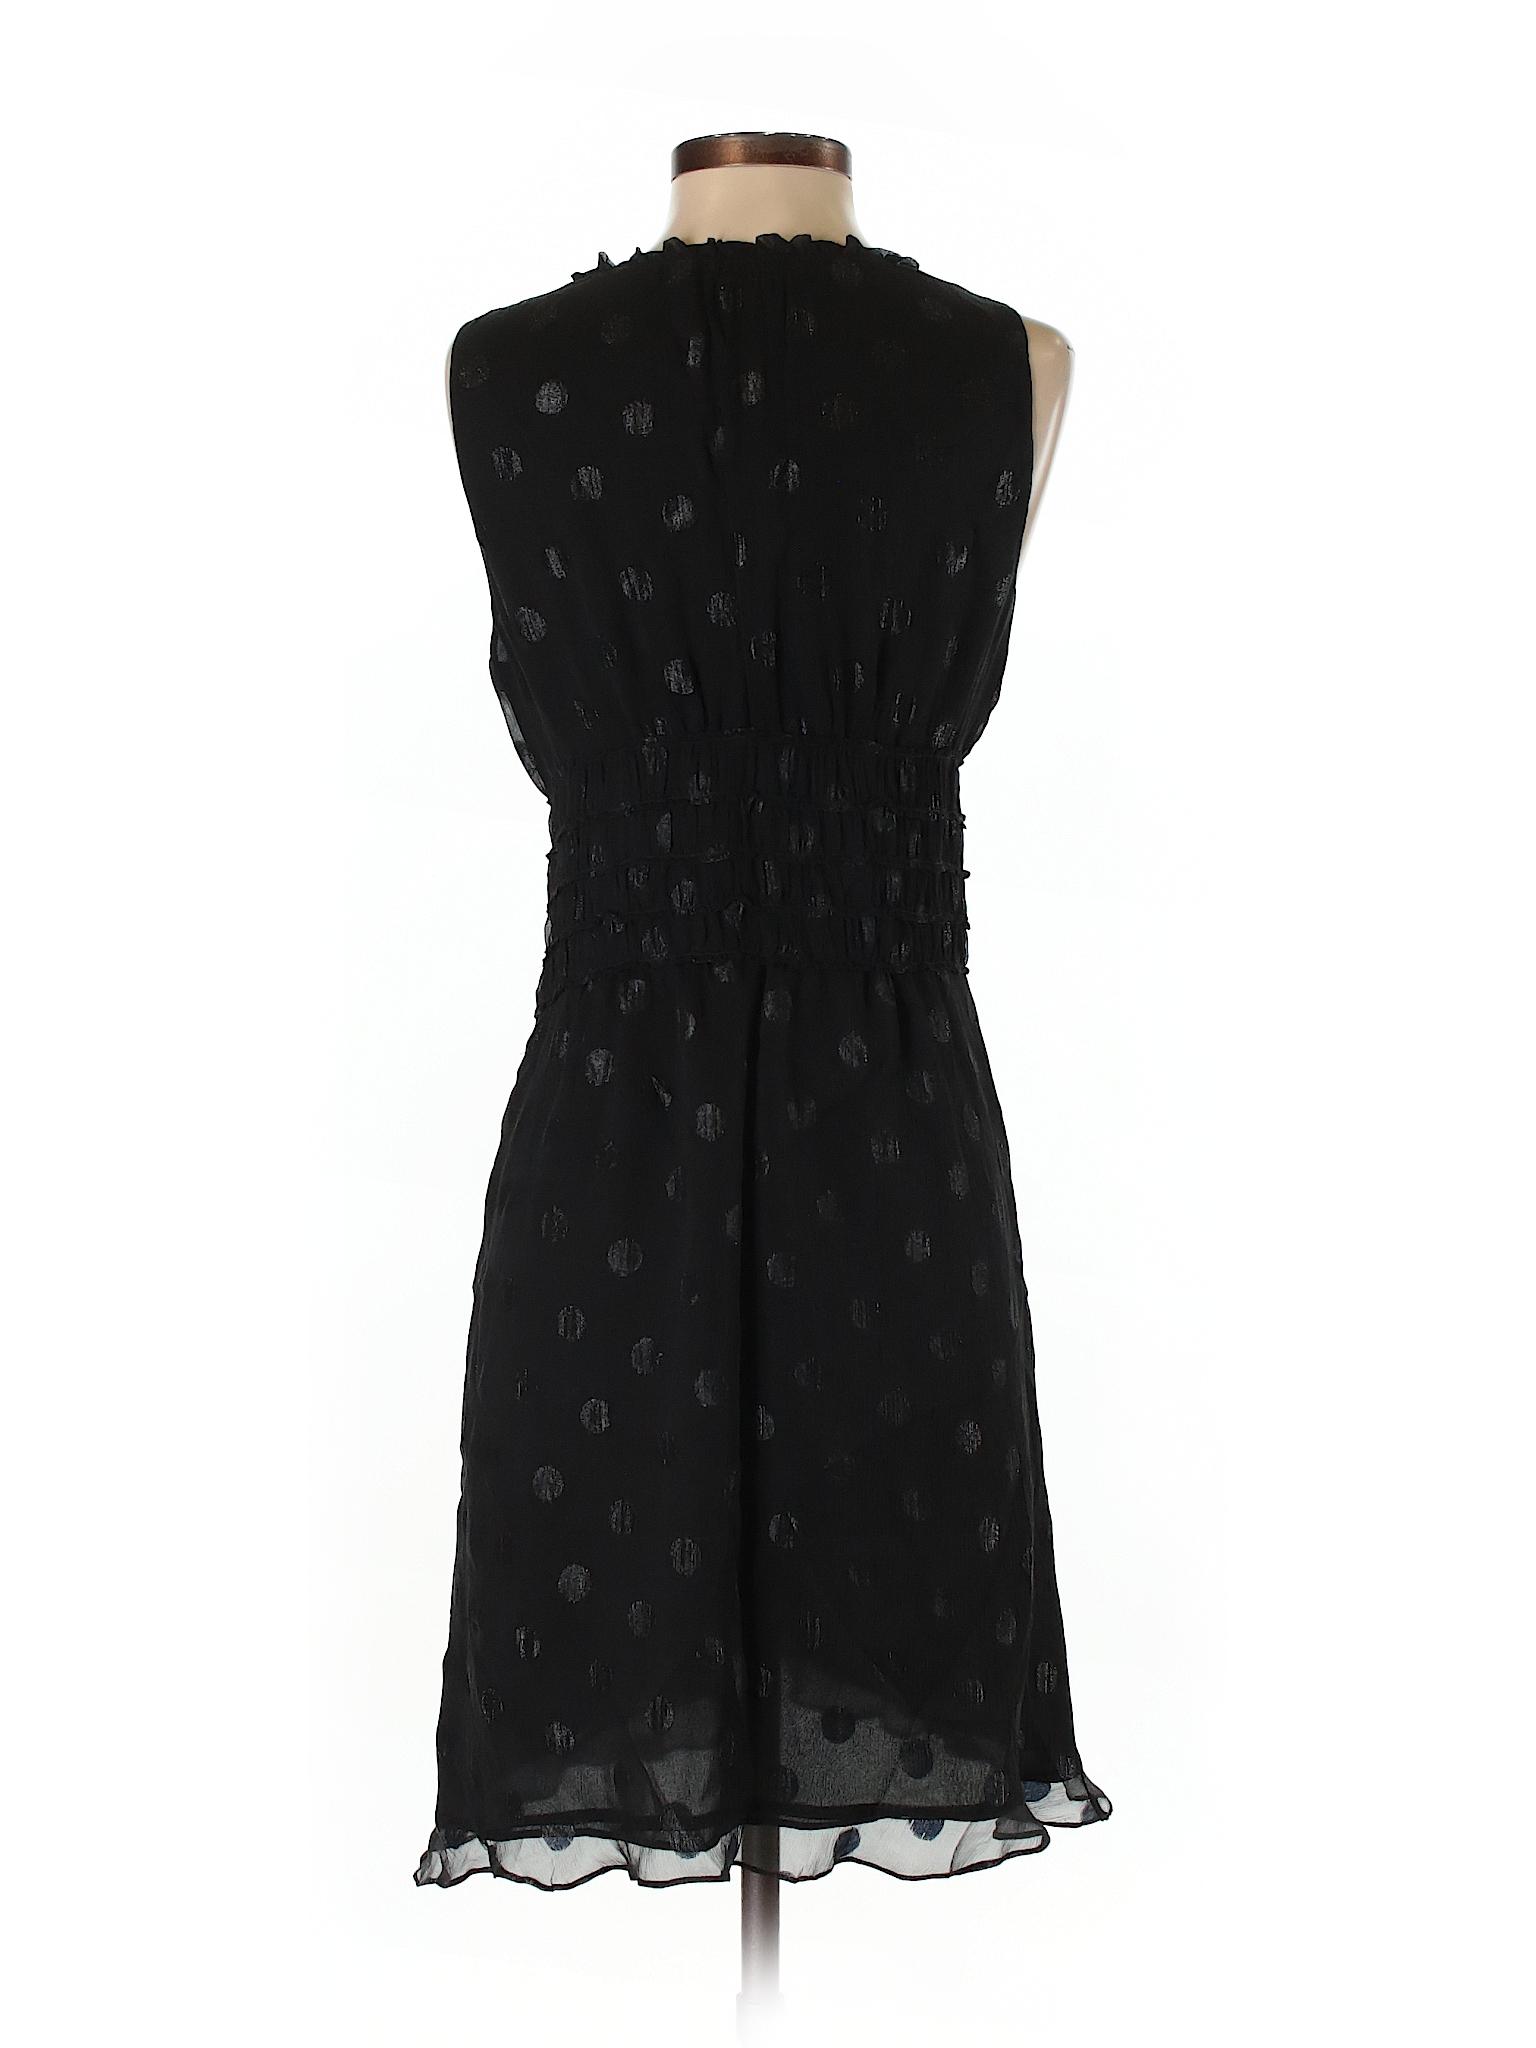 Boutique Derek winter Casual Lam Dress FFrwOPZ8q